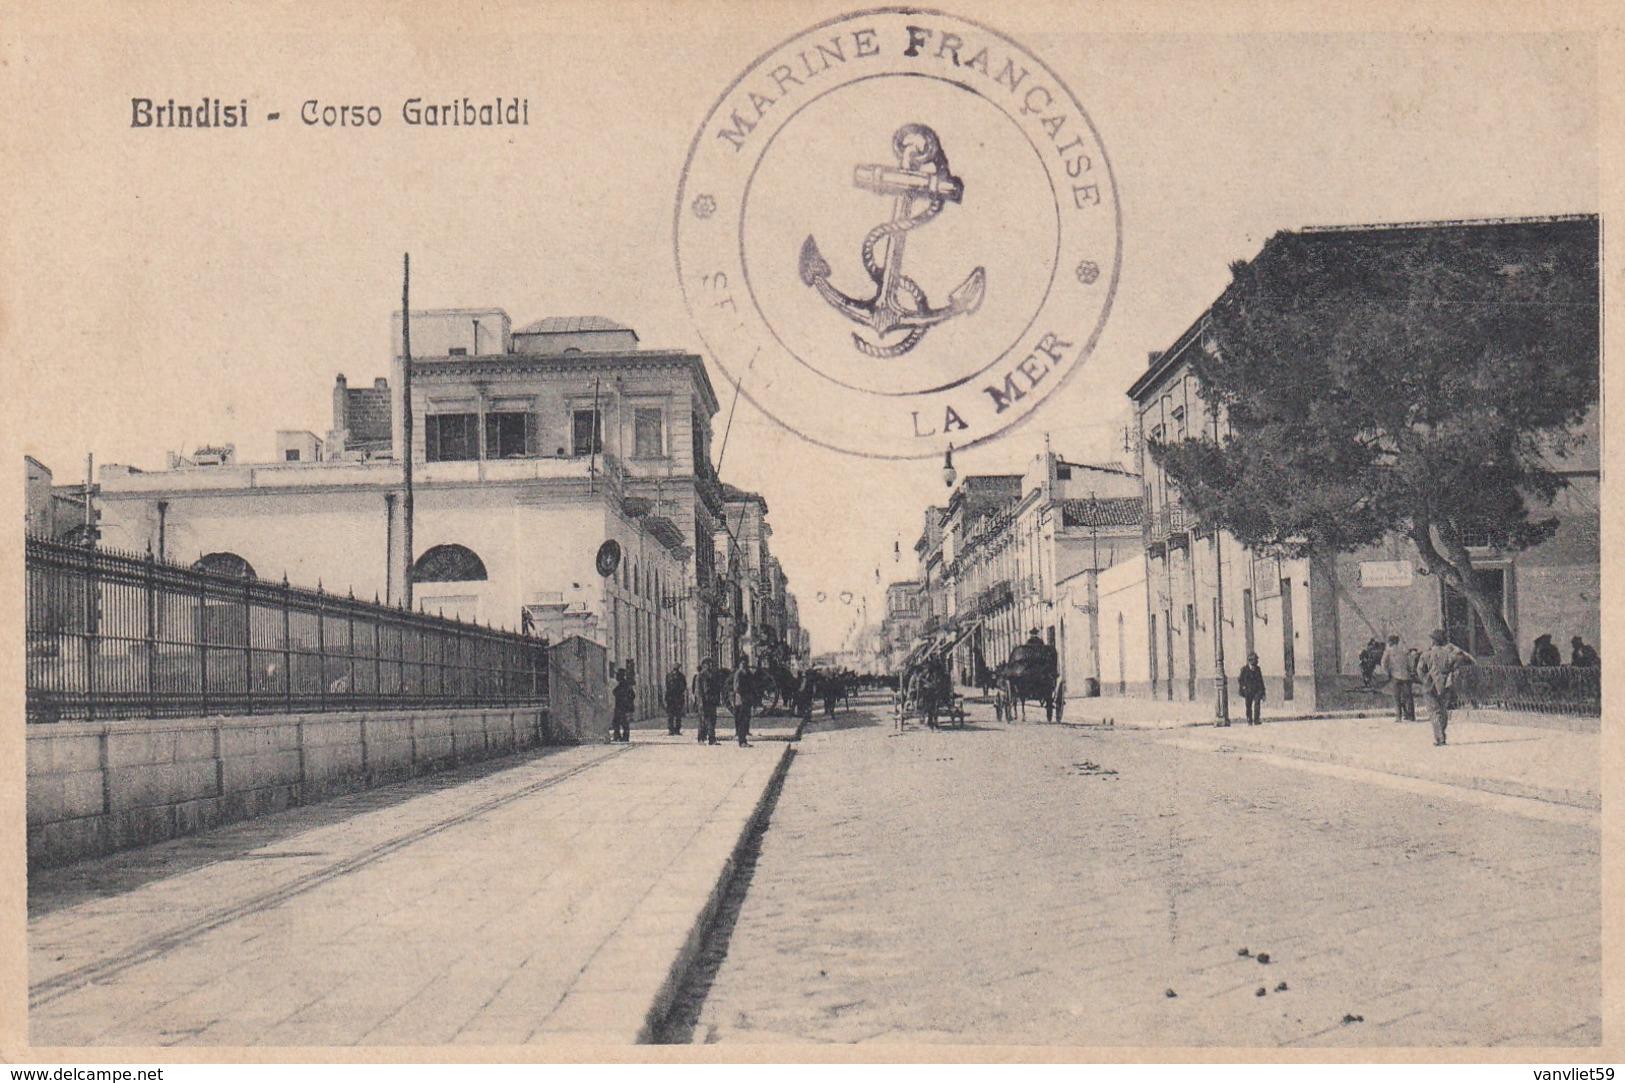 BRINDISI-CORSO GARIBALDI-CARTOLINA VIAGGIATA IL 11-4-1916 - Brindisi